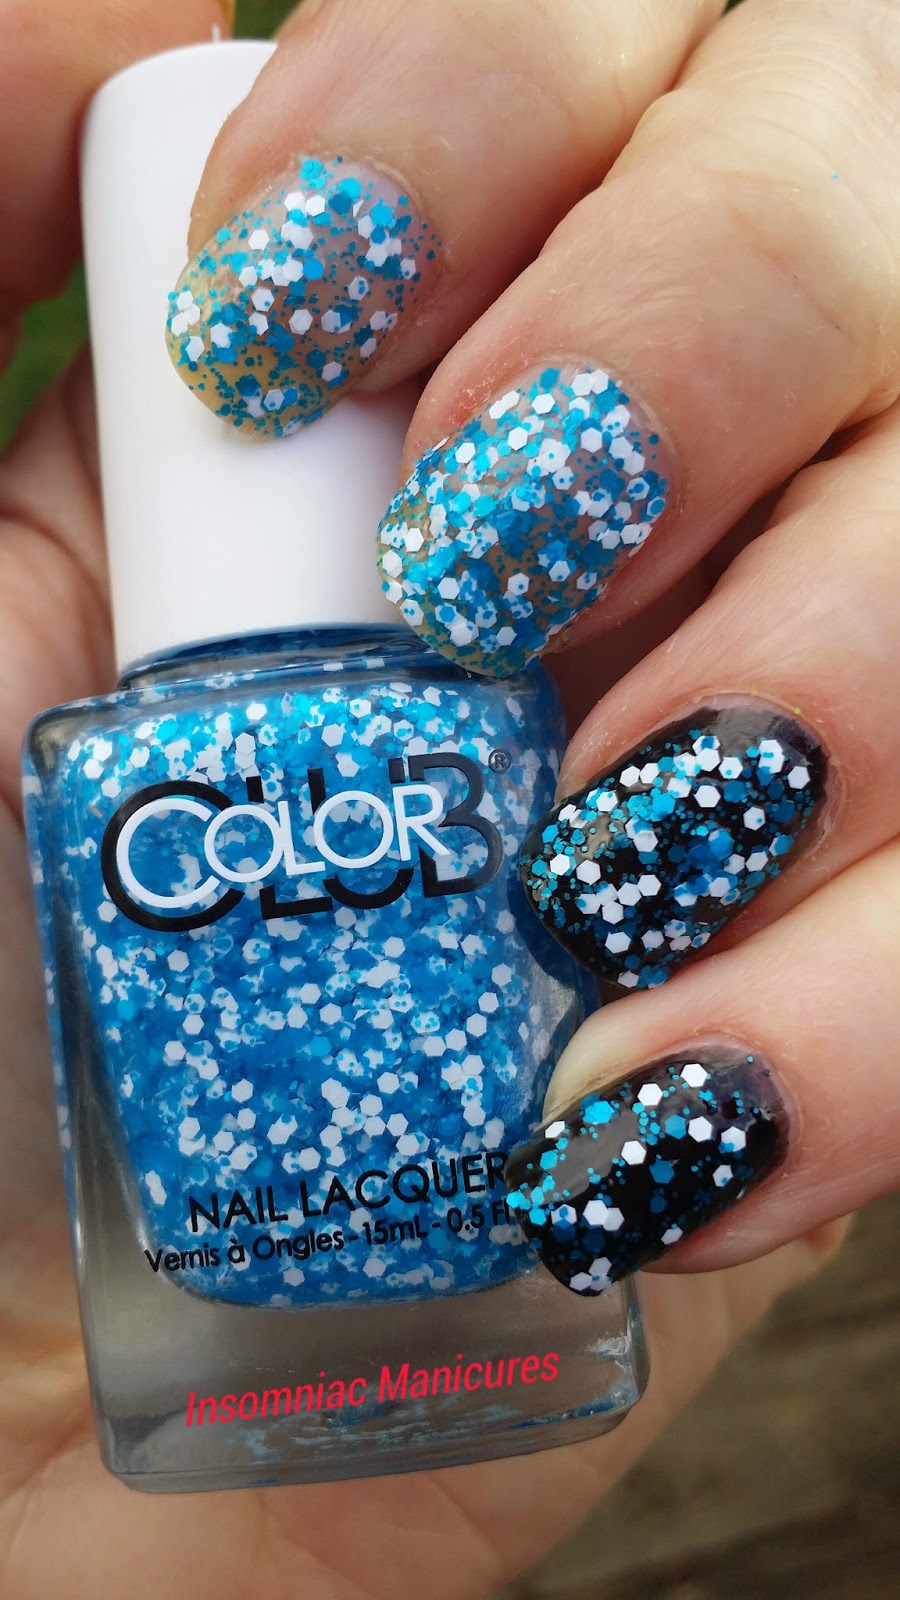 Color Club Nail Polish Daydream Believer